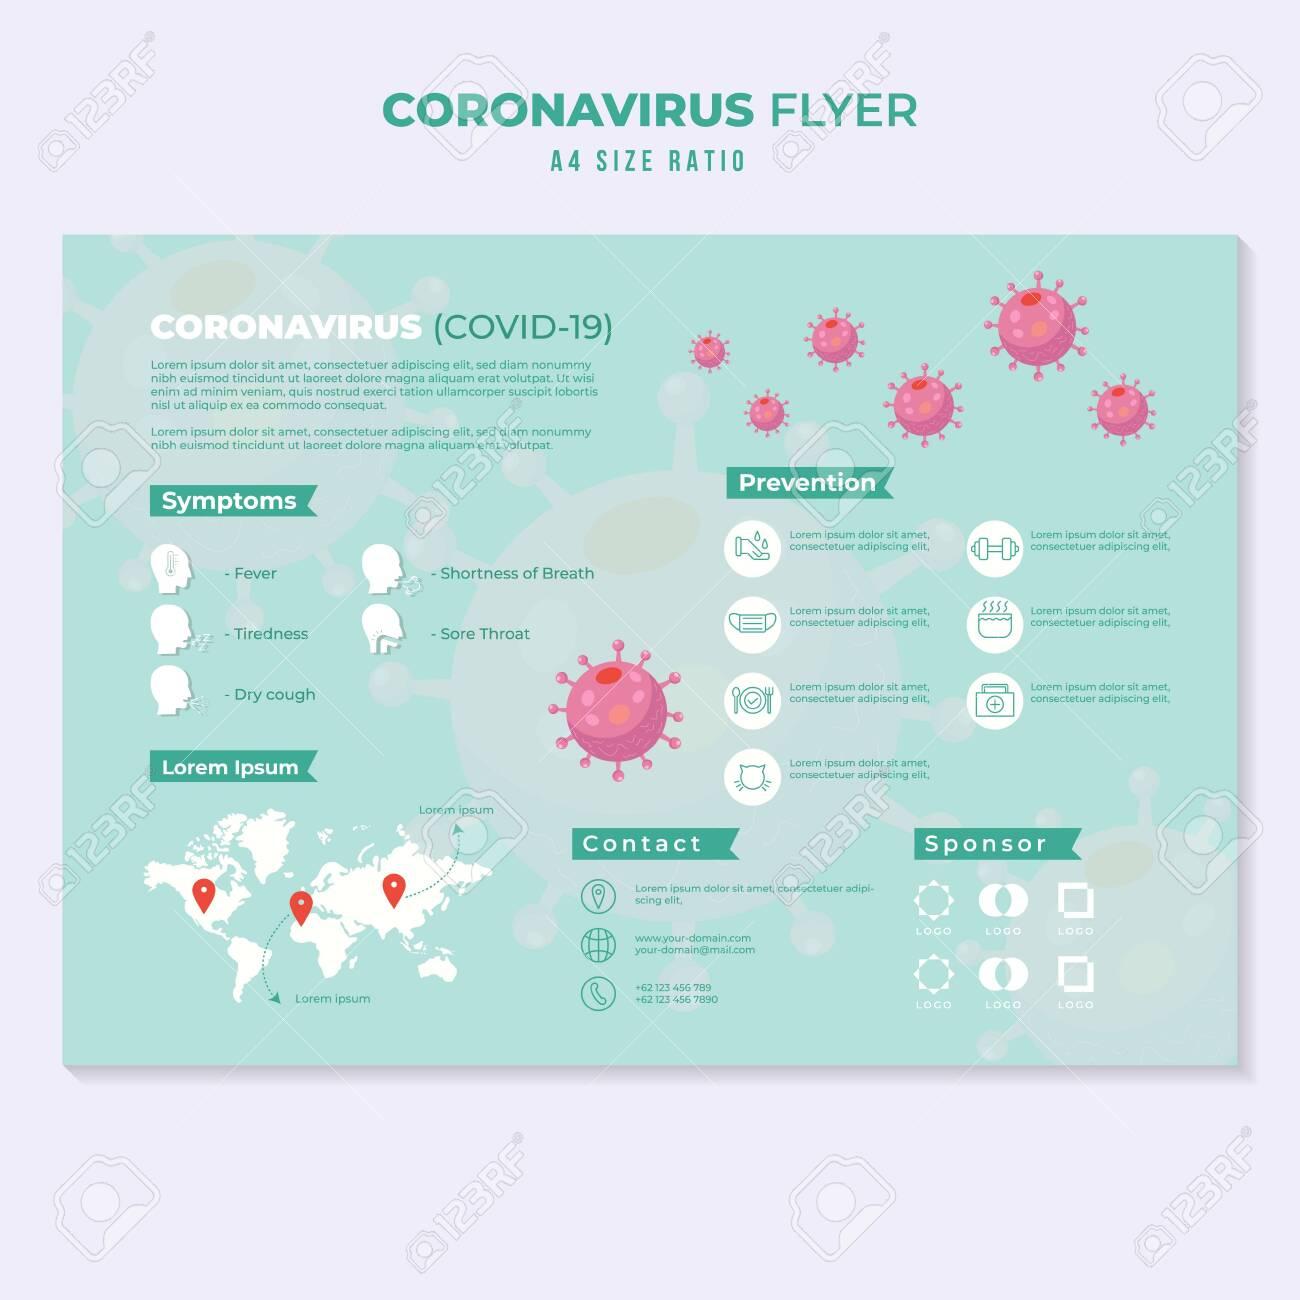 corona virus pandemic flyer education template infographic - 144506912